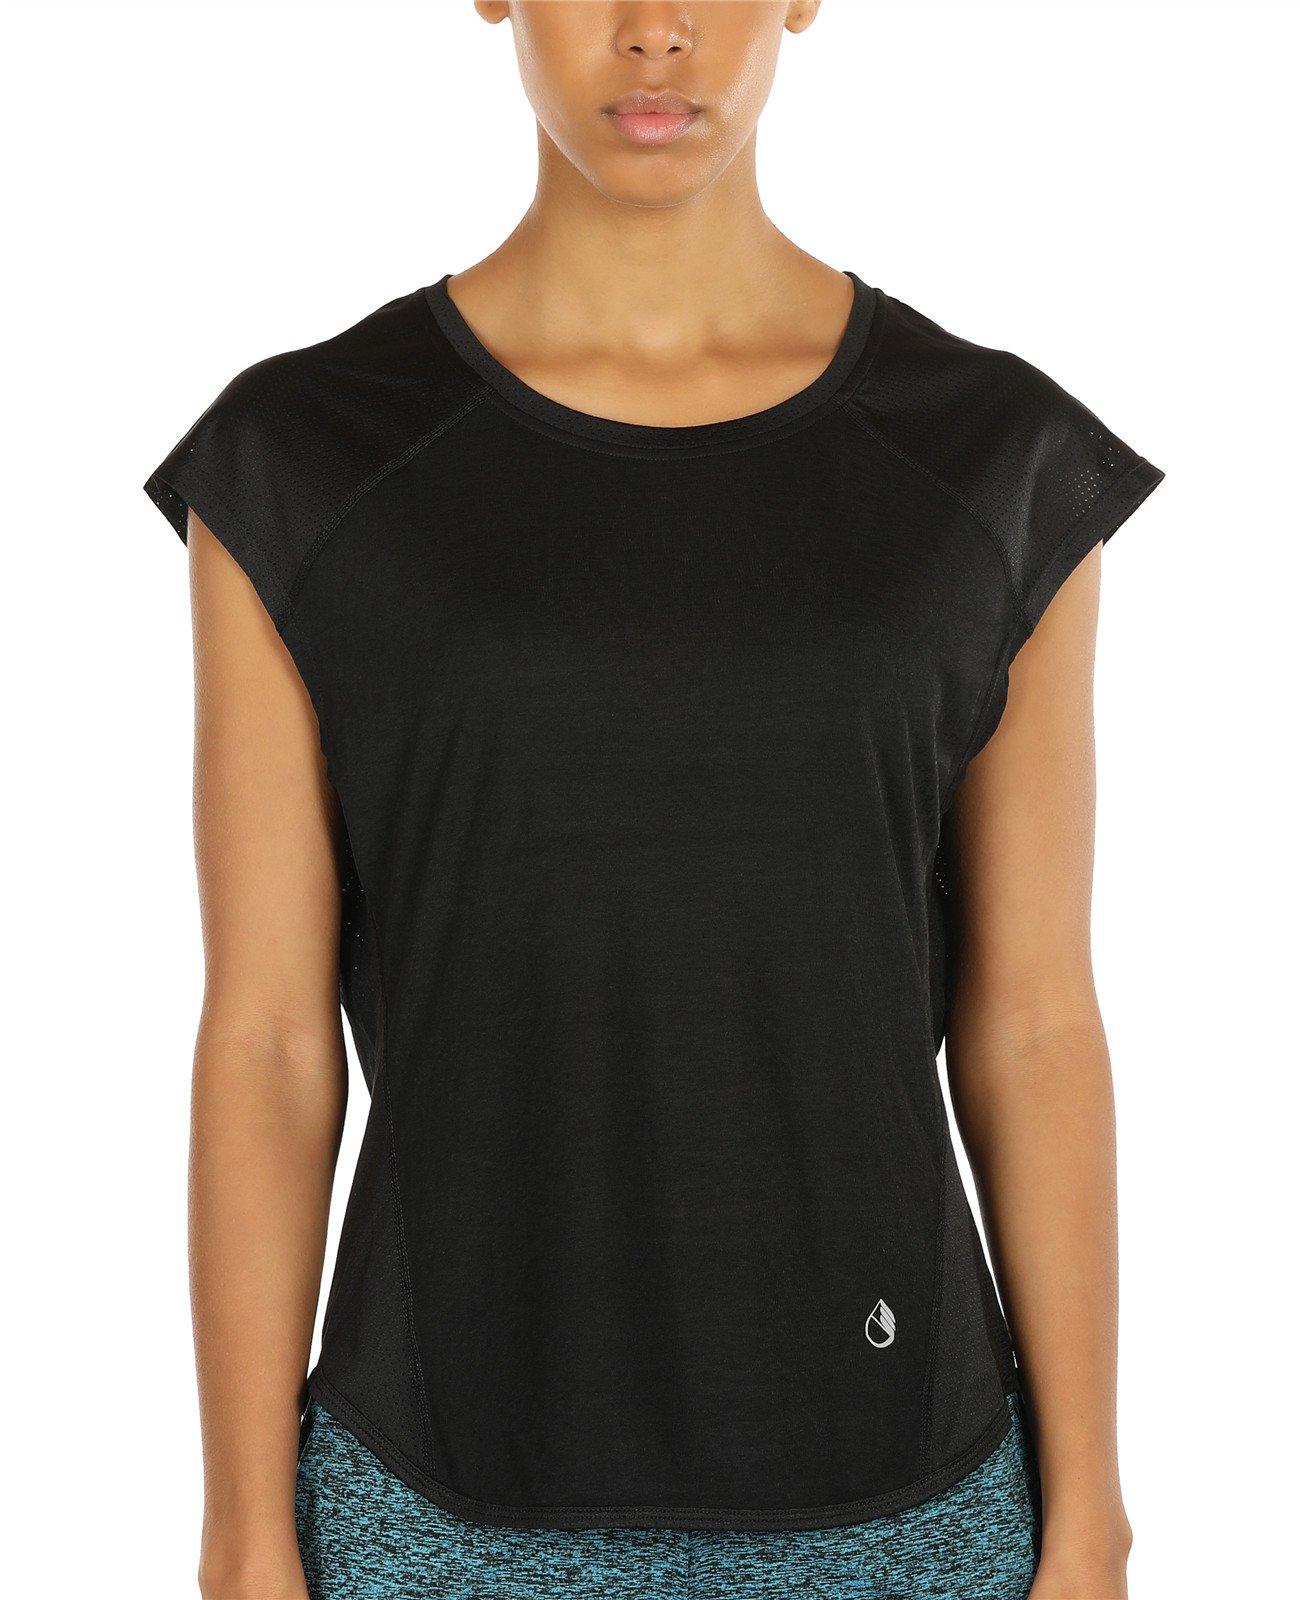 icyZone Yoga Tops Activewear Raglan Workout tank tops Fitness Sleeveless Shirts for Women (M, Black)